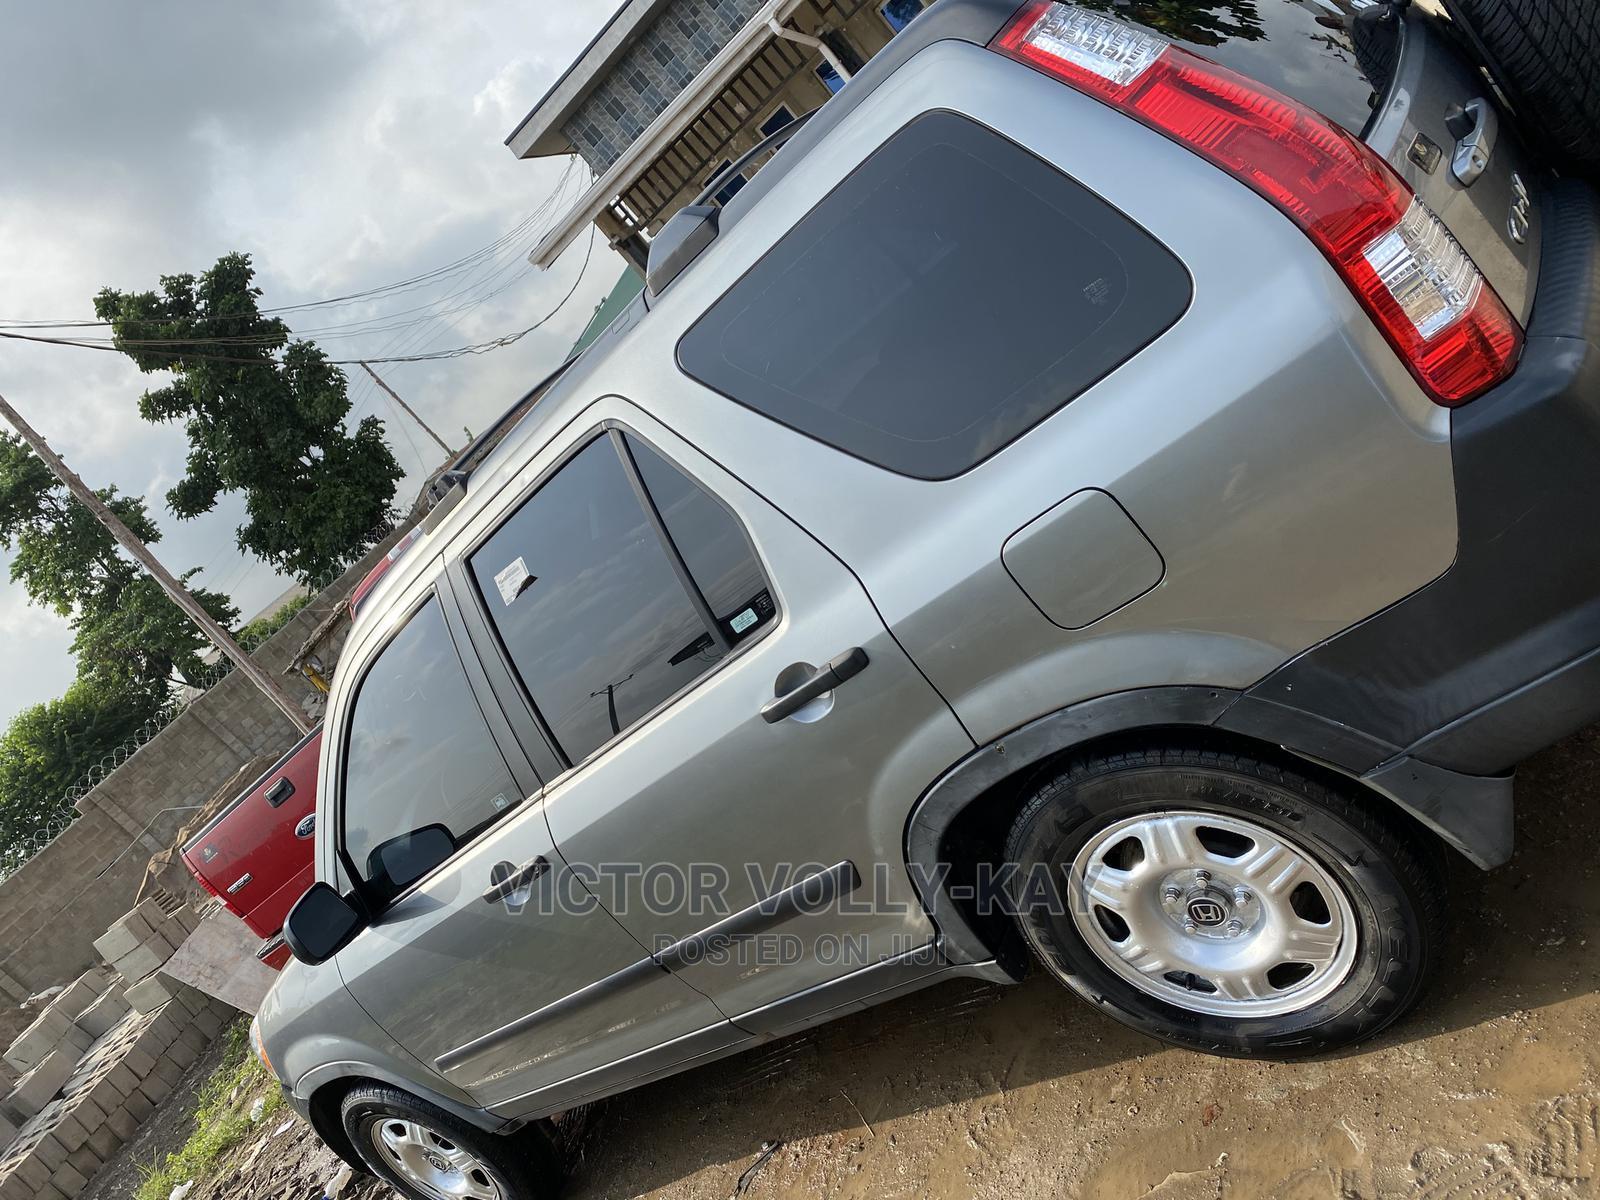 Honda CR-V 2006 SE 4WD Automatic Gray | Cars for sale in Ibadan, Oyo State, Nigeria